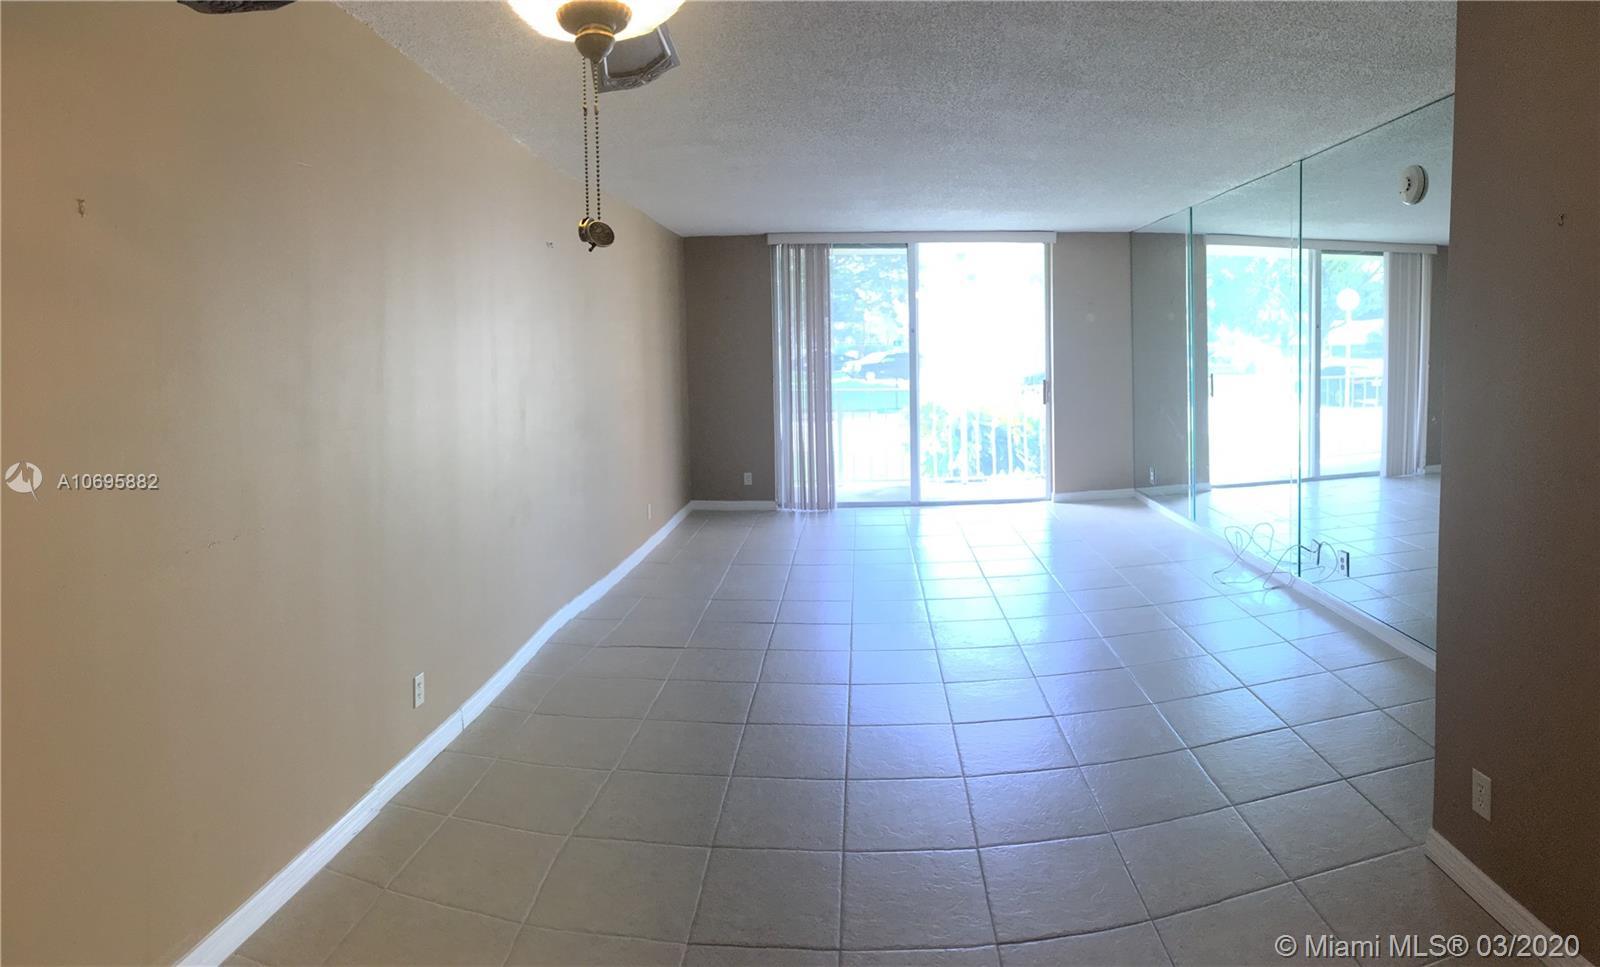 480  Executive Center Dr #1J For Sale A10695882, FL